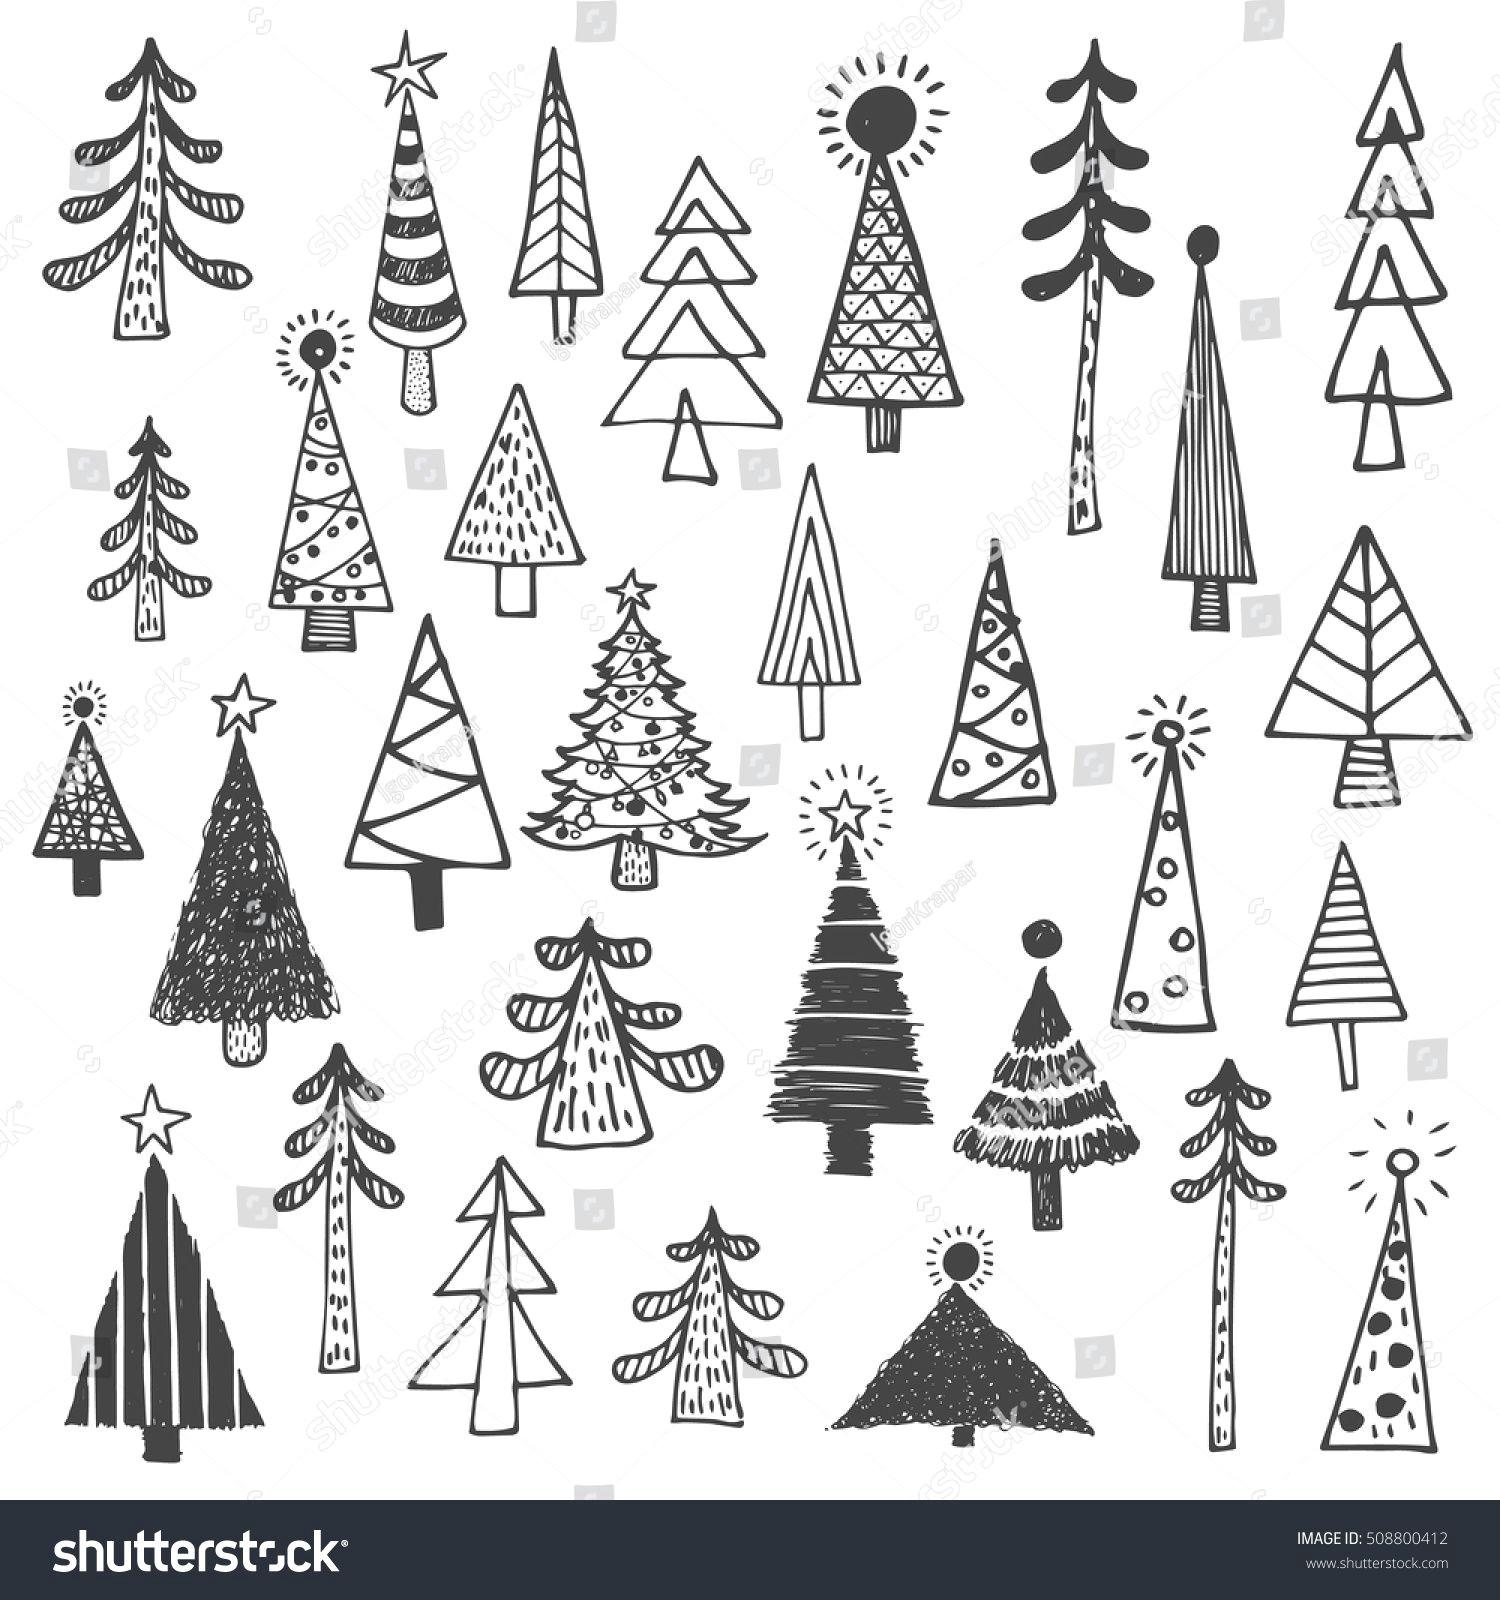 Easy Drawings Christmas Tree Christmas Tree White Spruce Fir Fir Tree Simple Drawing Set Draw